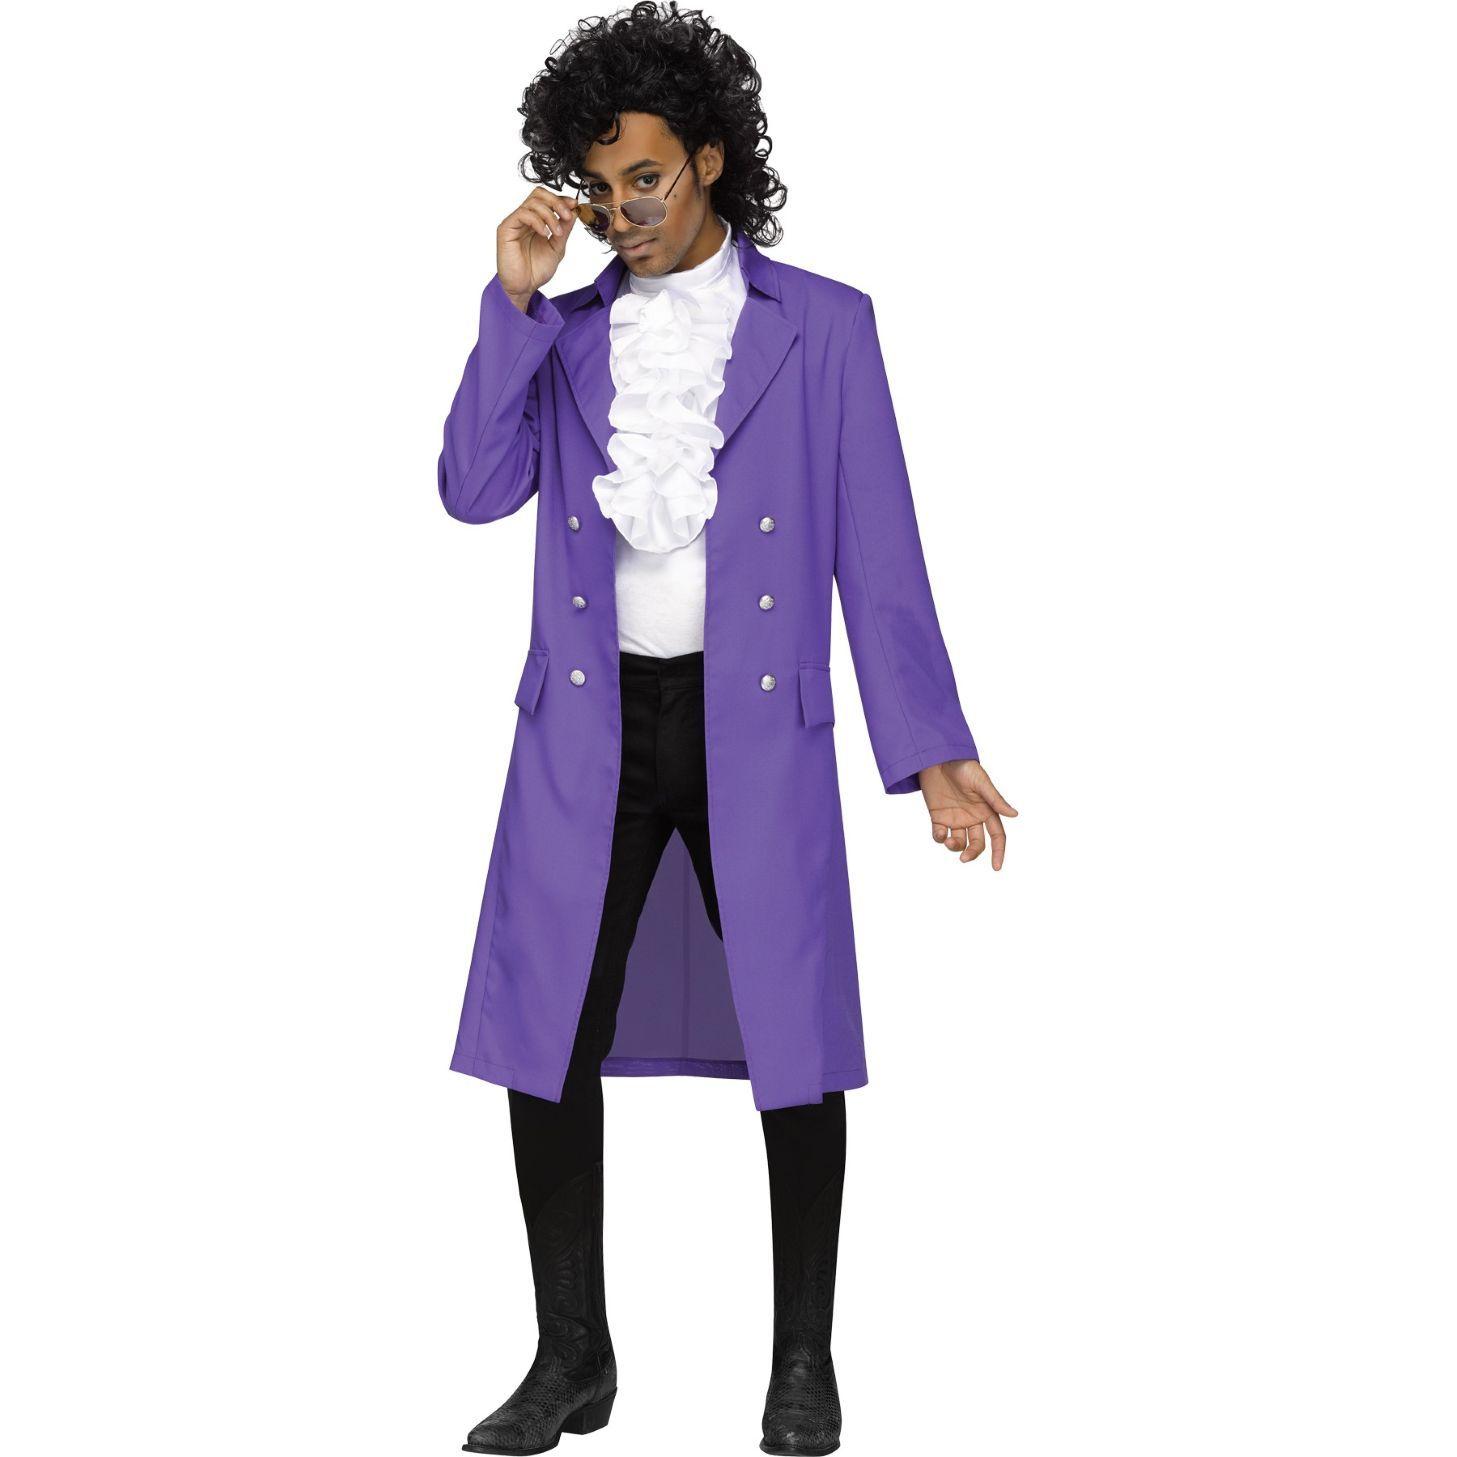 purple pain rock star - 80s Rocker Halloween Costume